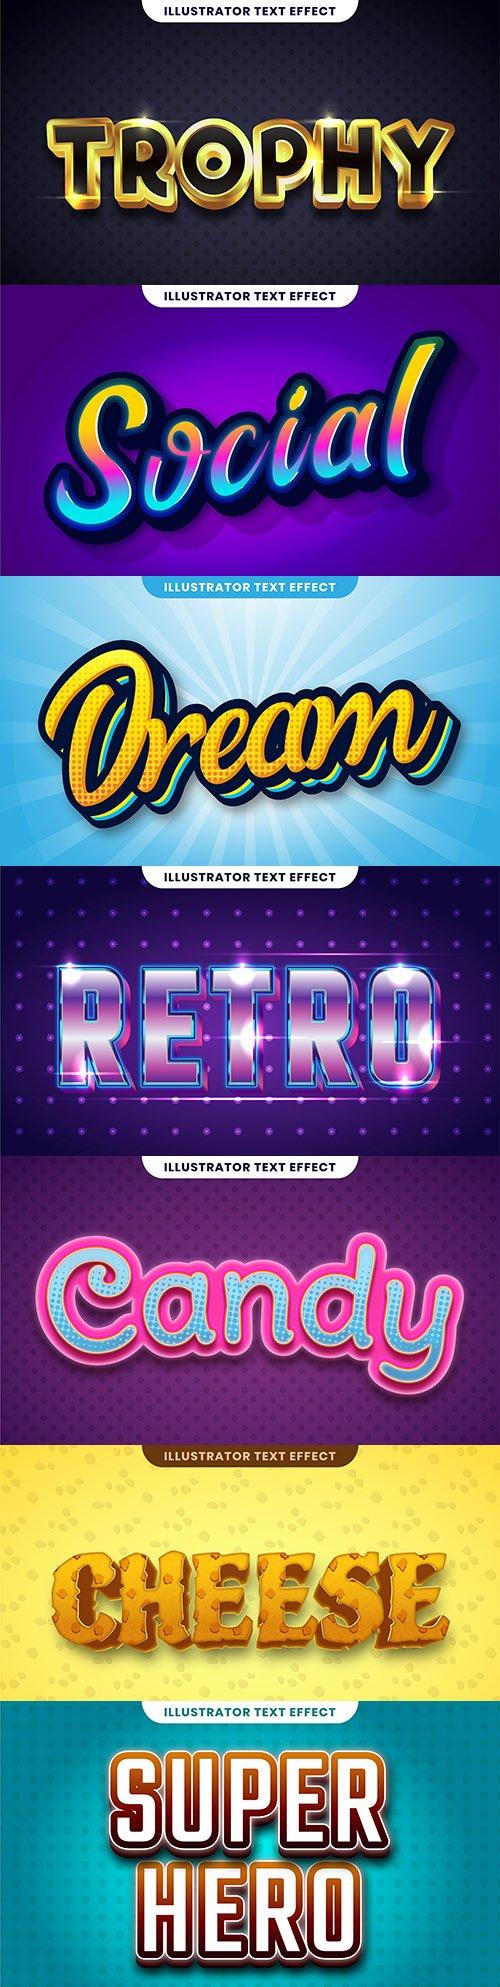 Editable font effect text collection illustration design 180